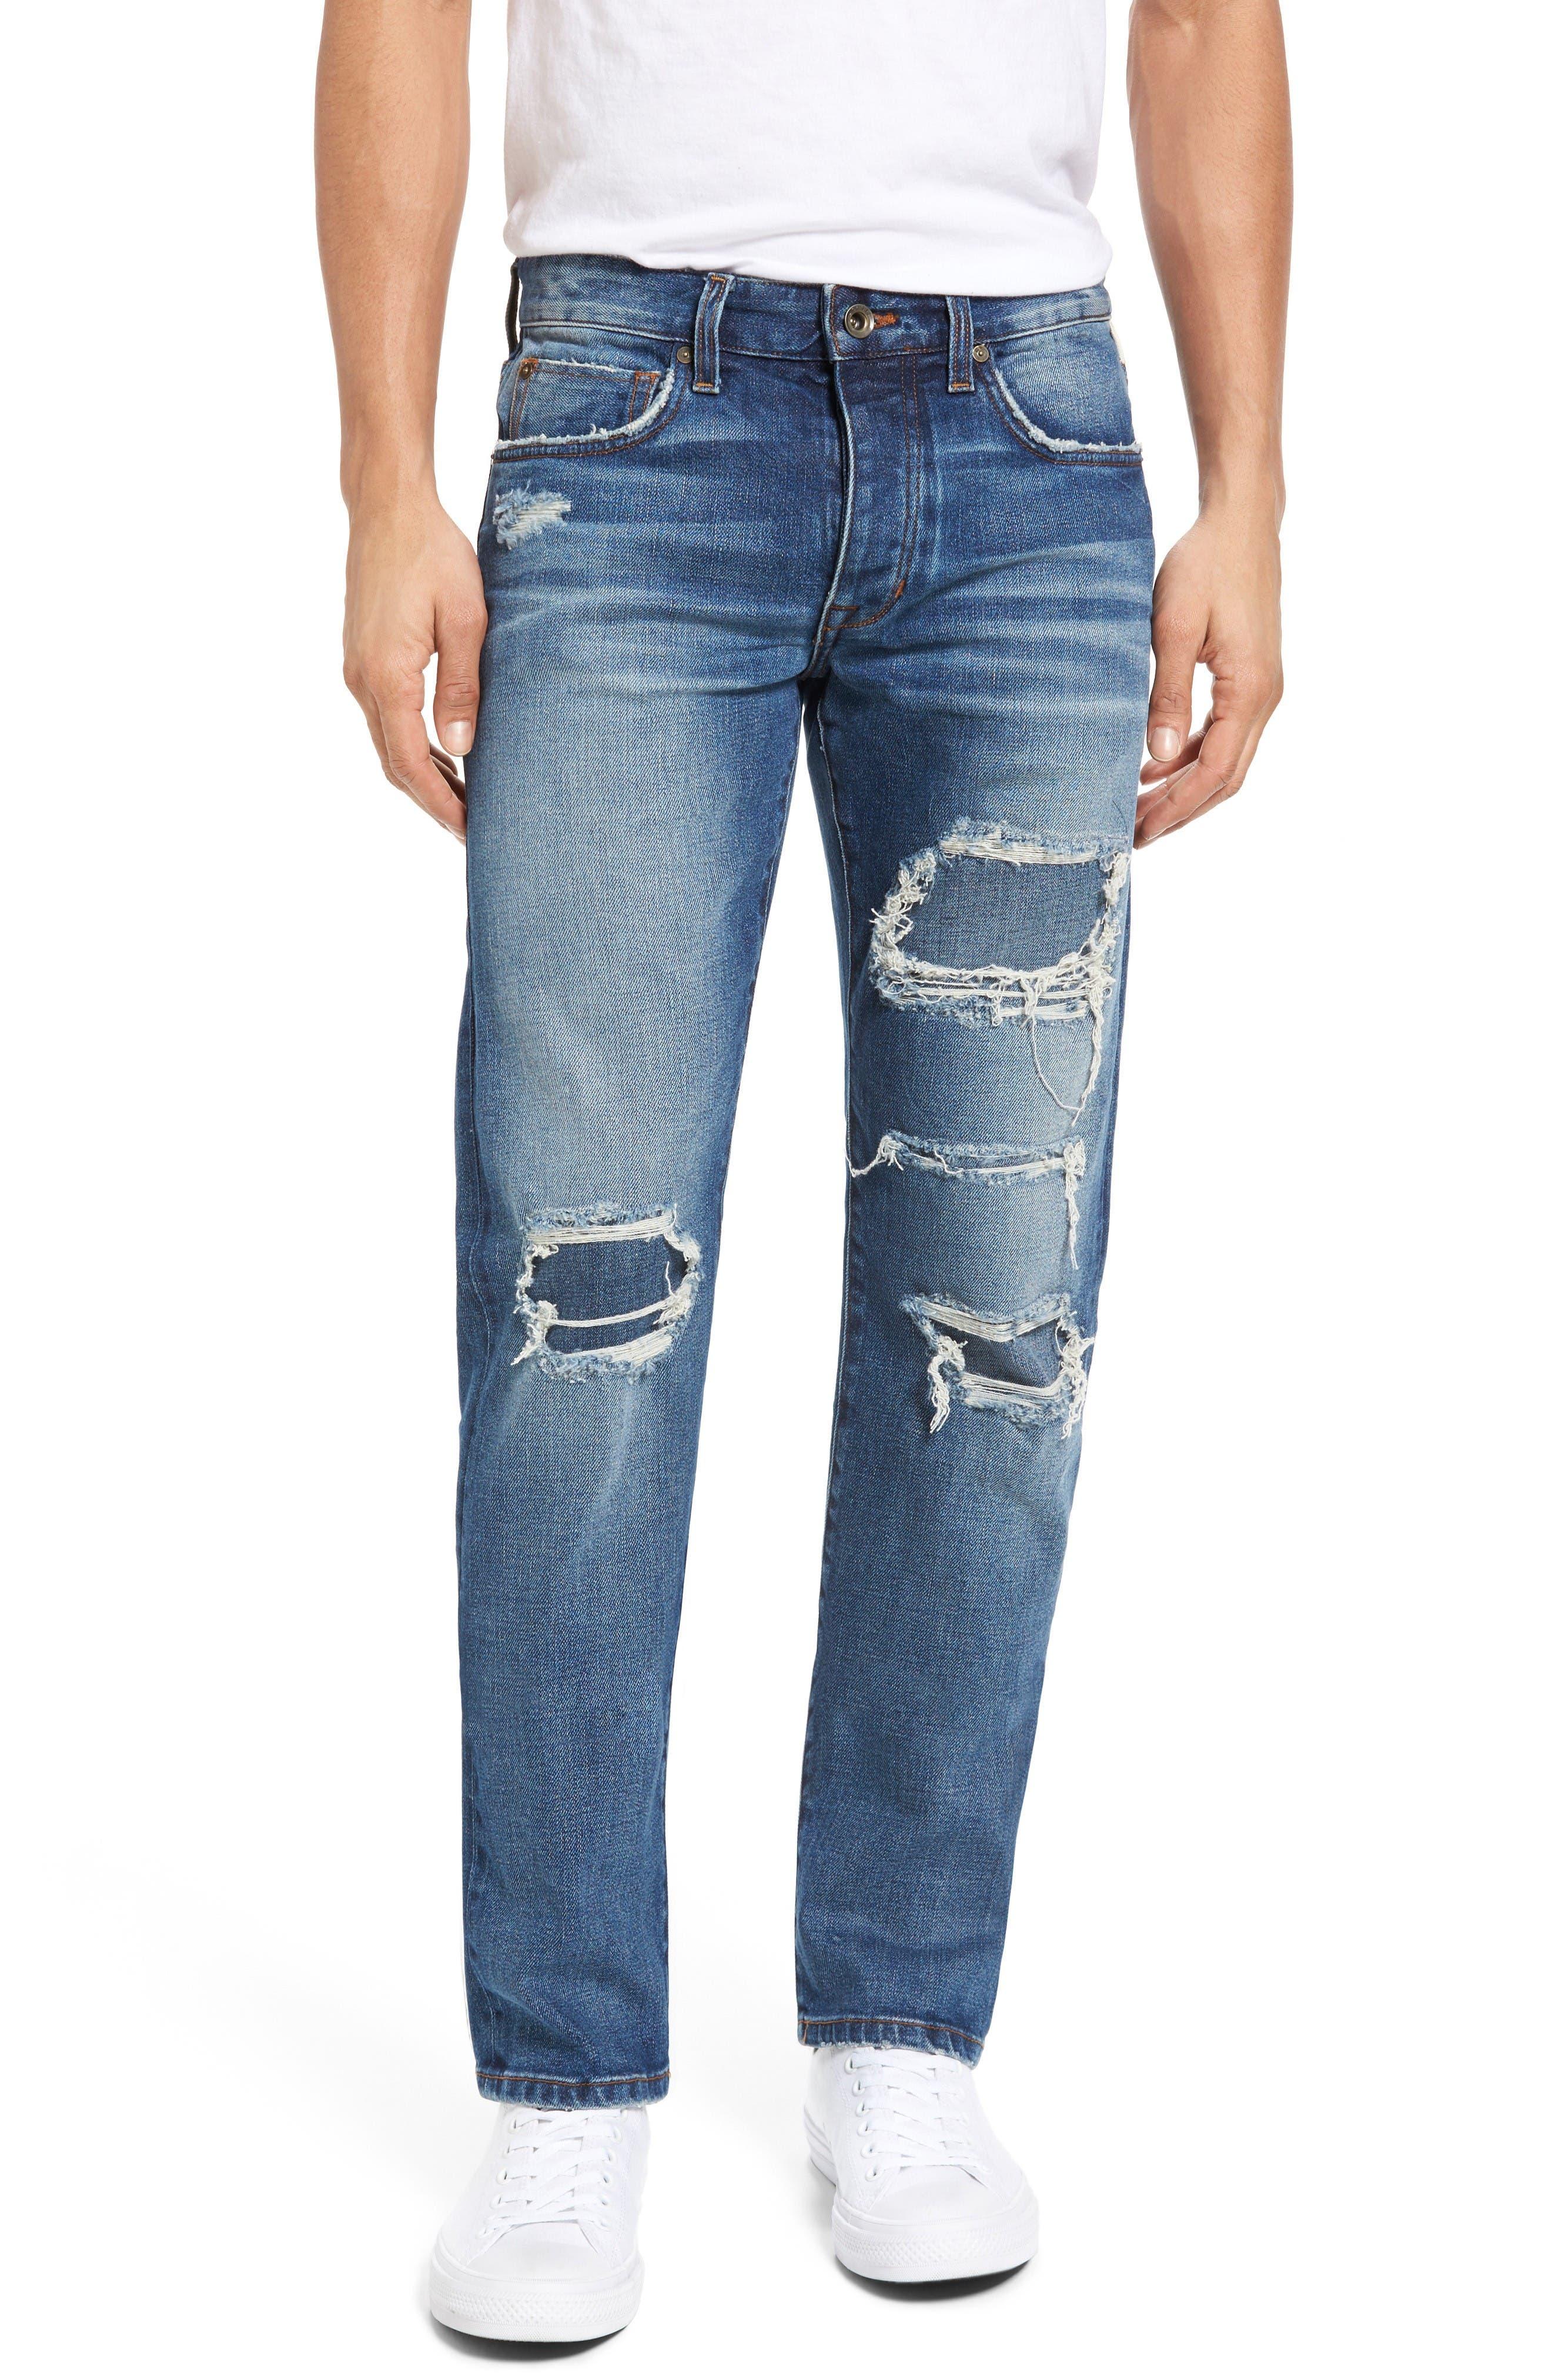 Brixton Slim Fit Jeans,                         Main,                         color, Guru